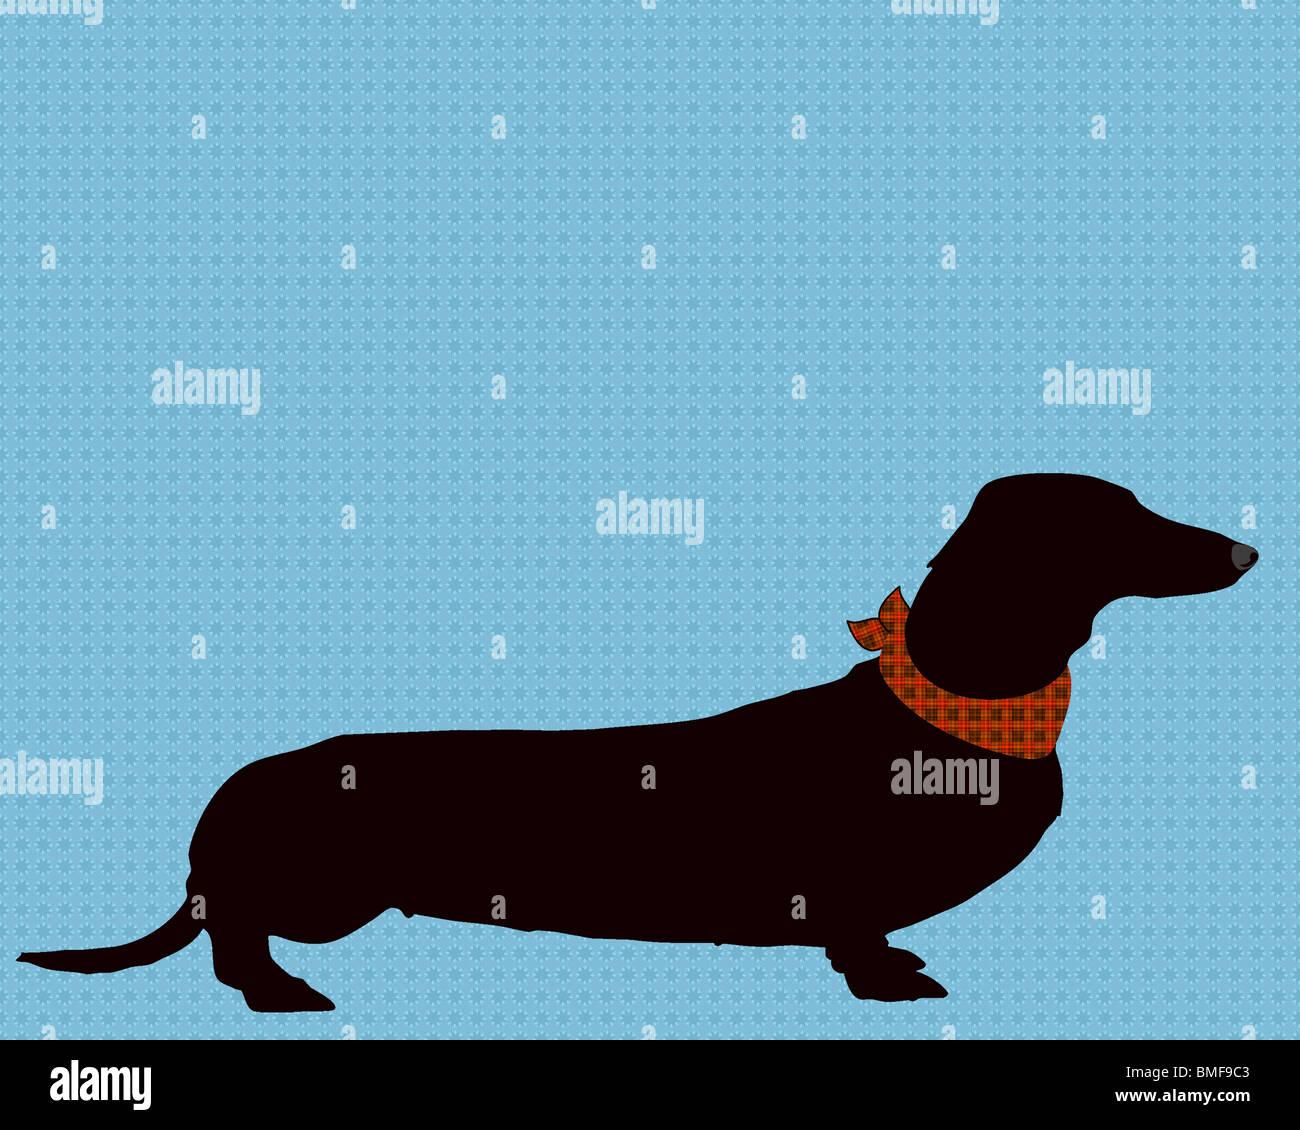 Kunst, Illustration, Print, Dackel, Hund, Haustier, Tier, pet-Liebhaber, Hundeliebhaber, Silhouette, Haustiere, Stockbild